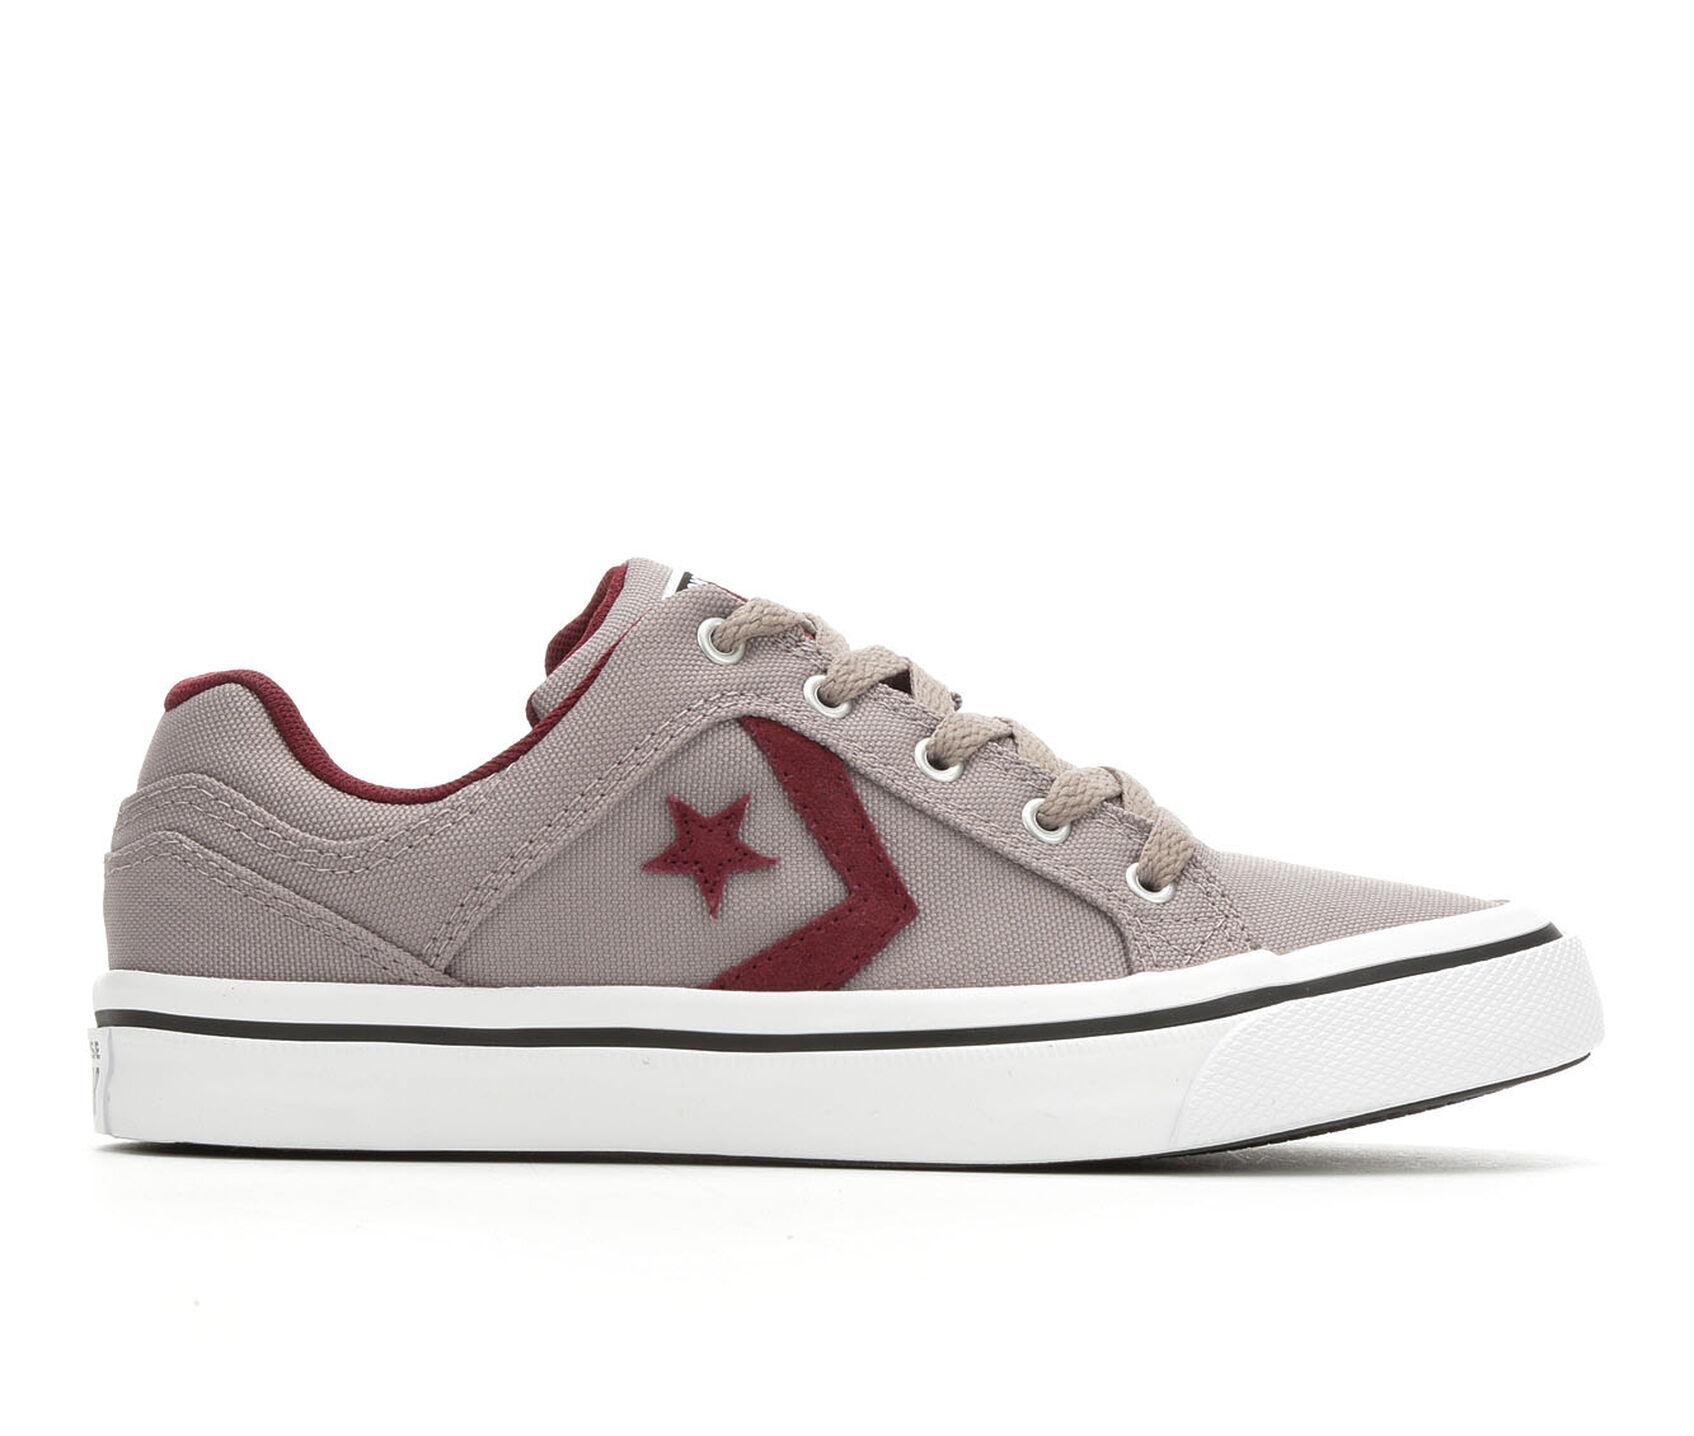 59773dc30e55 Women s Converse El Distrito Ox Sneakers